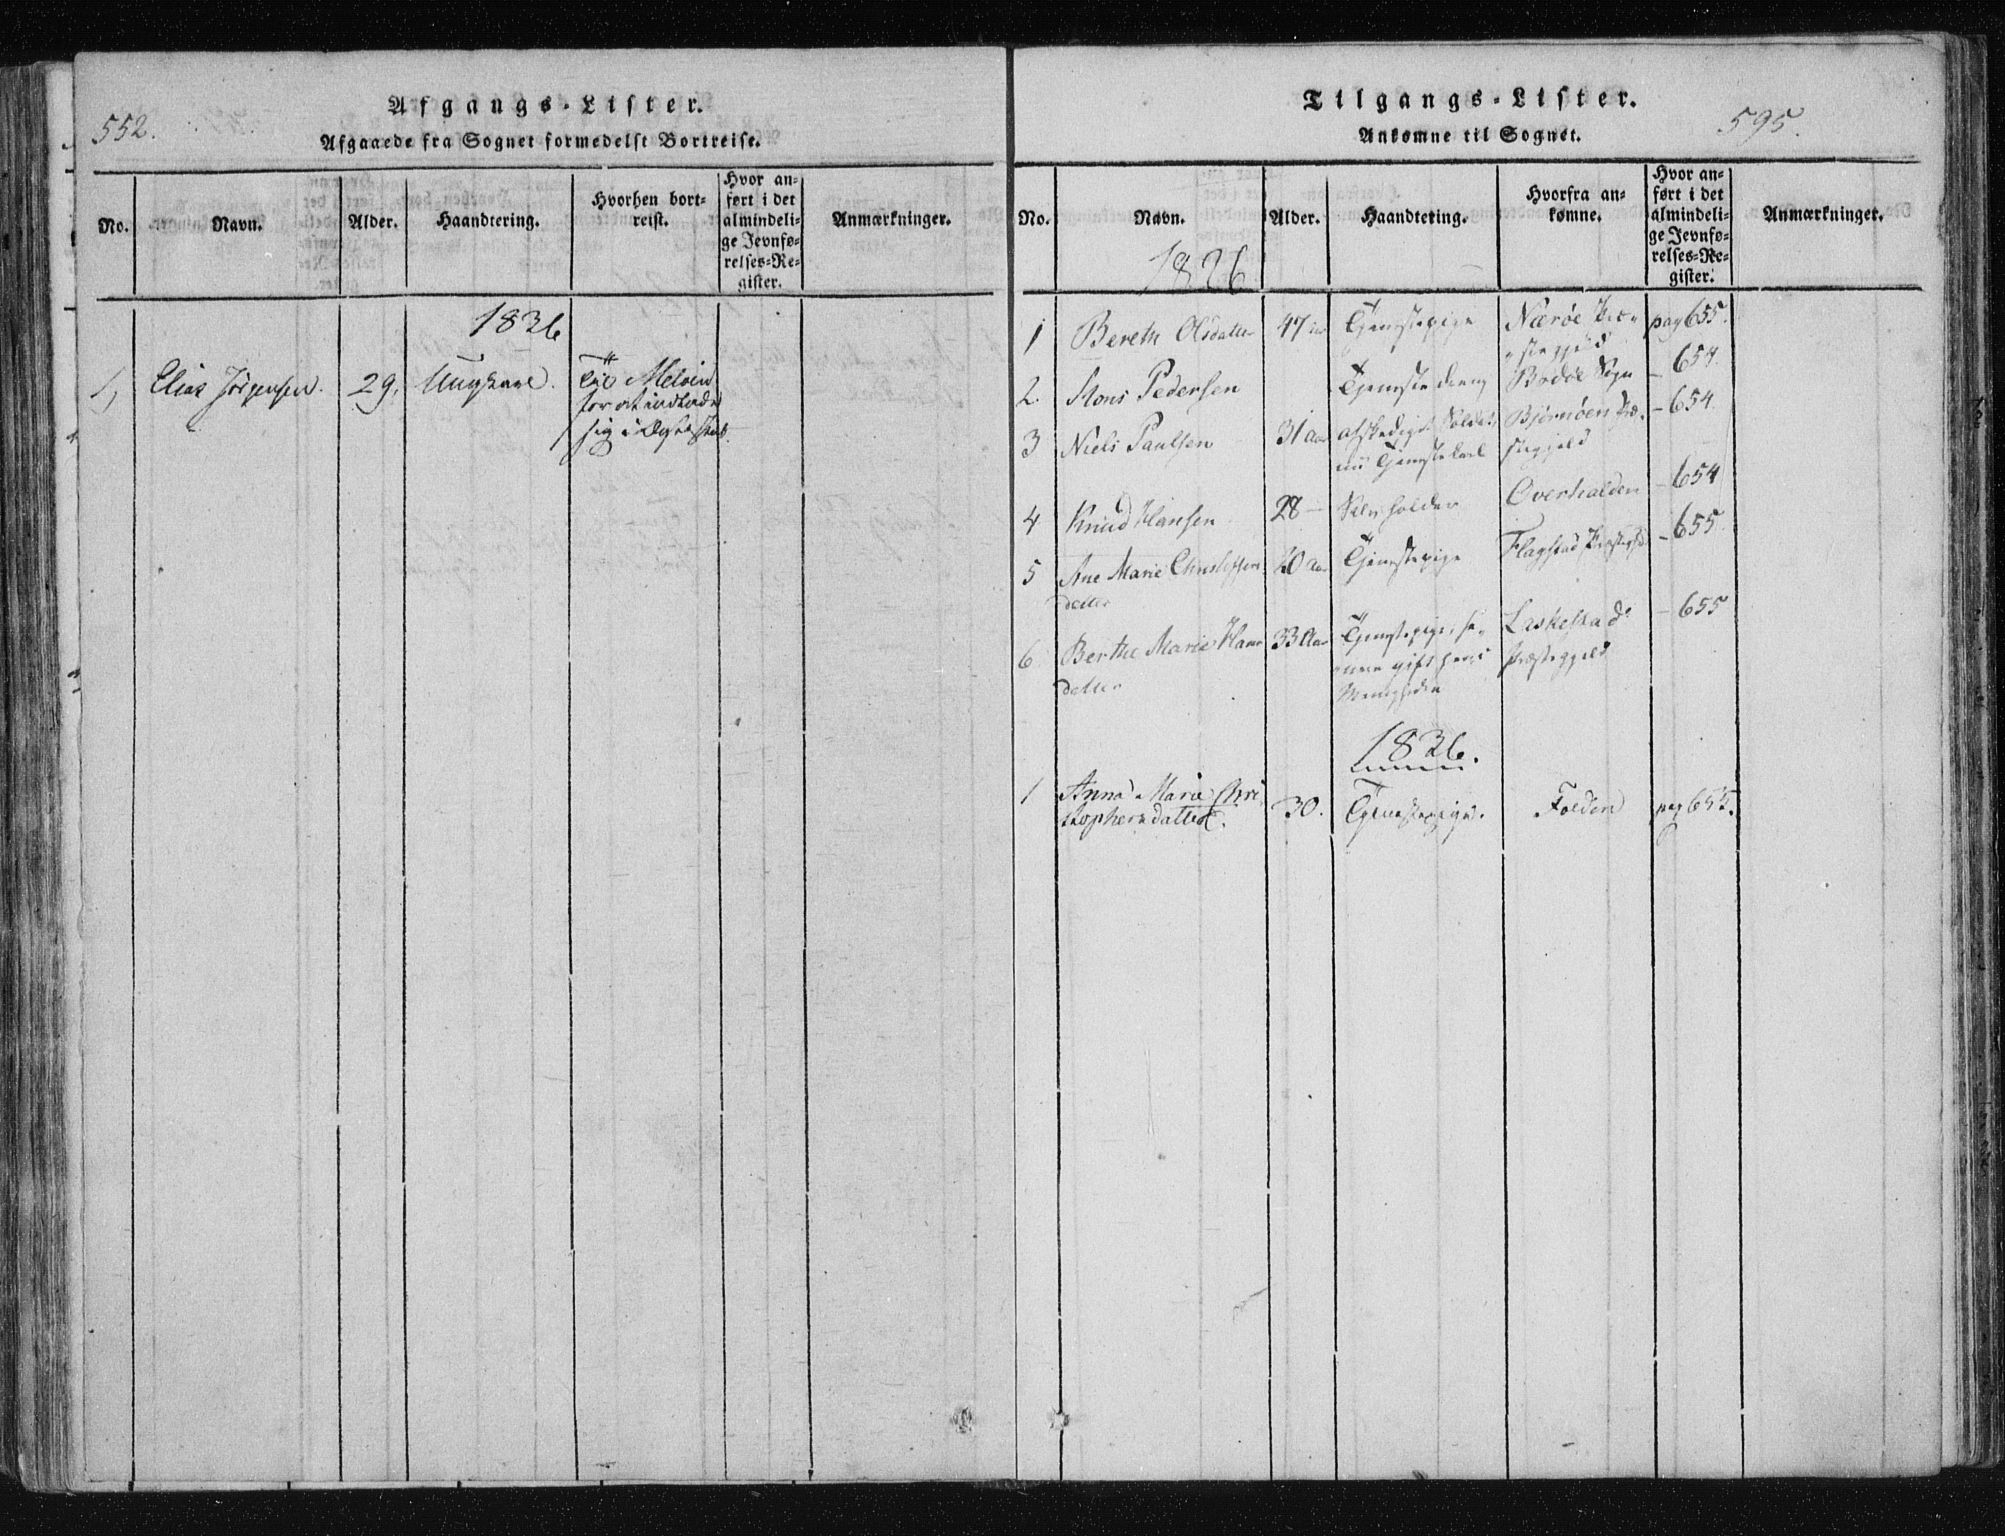 SAT, Ministerialprotokoller, klokkerbøker og fødselsregistre - Nordland, 805/L0096: Ministerialbok nr. 805A03, 1820-1837, s. 594-595